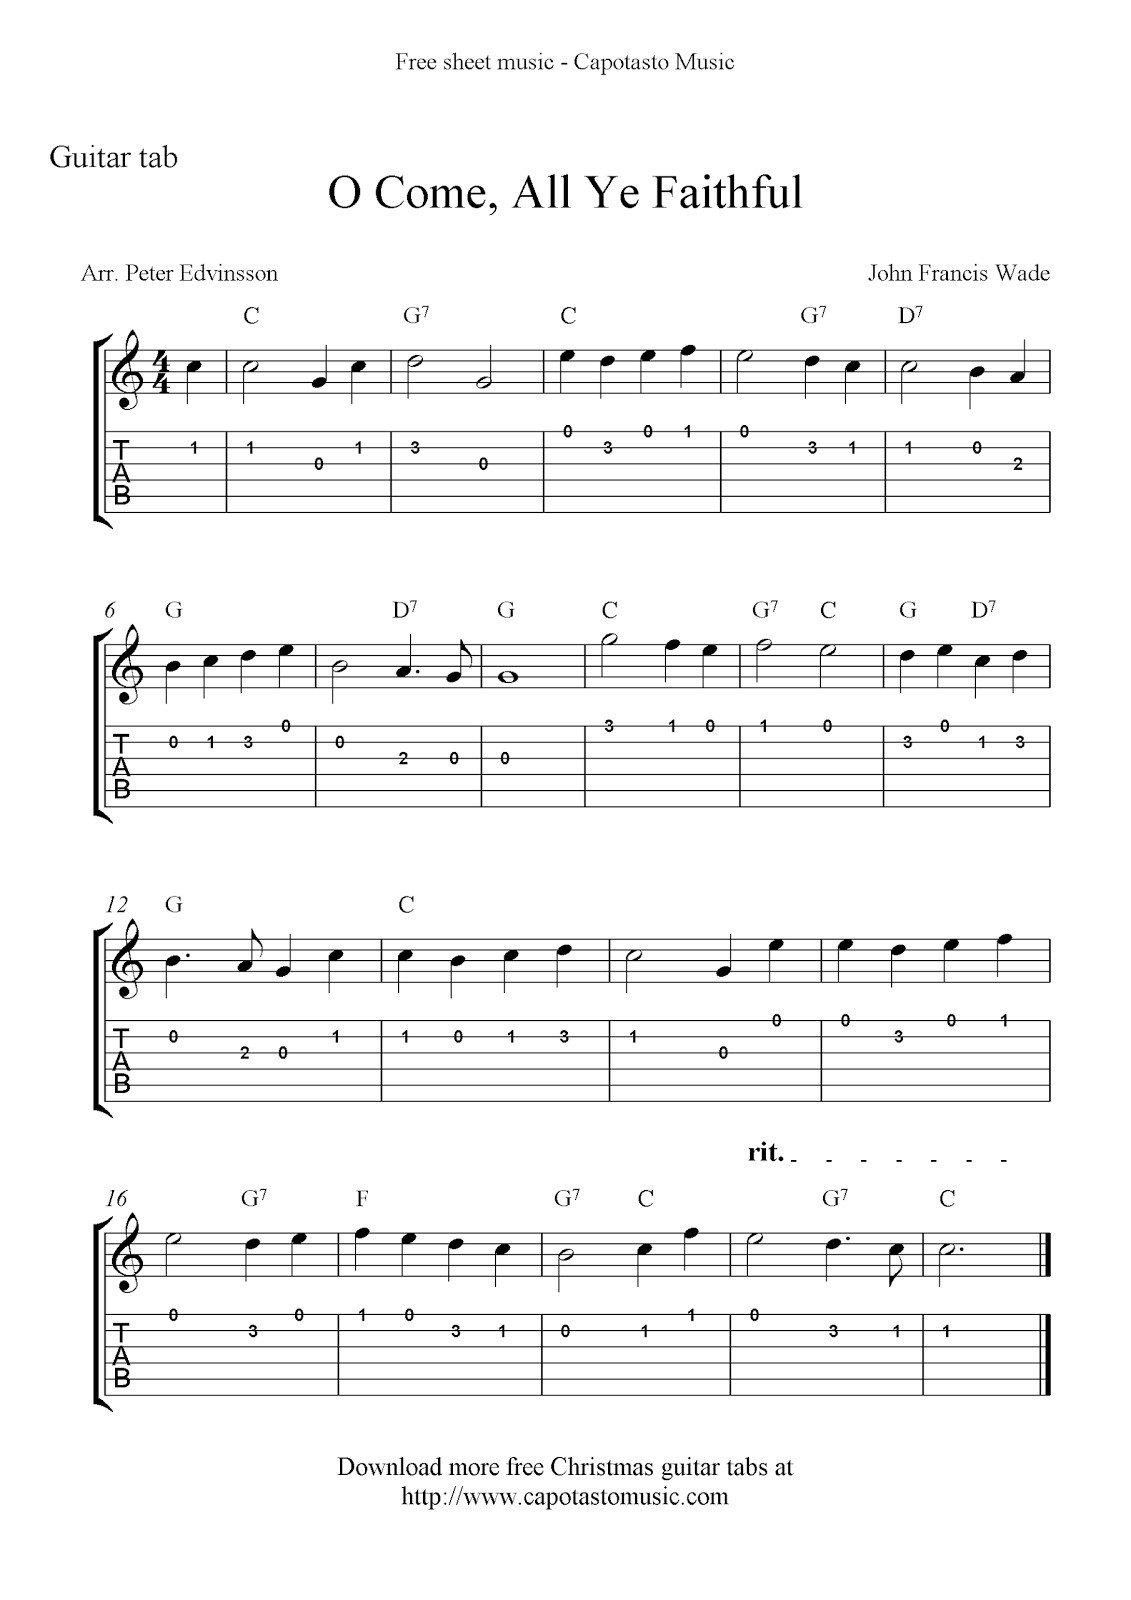 Free Printable Sheet Music: O Come, All Ye Faithful, Easy Free - Free Printable Guitar Tabs For Beginners